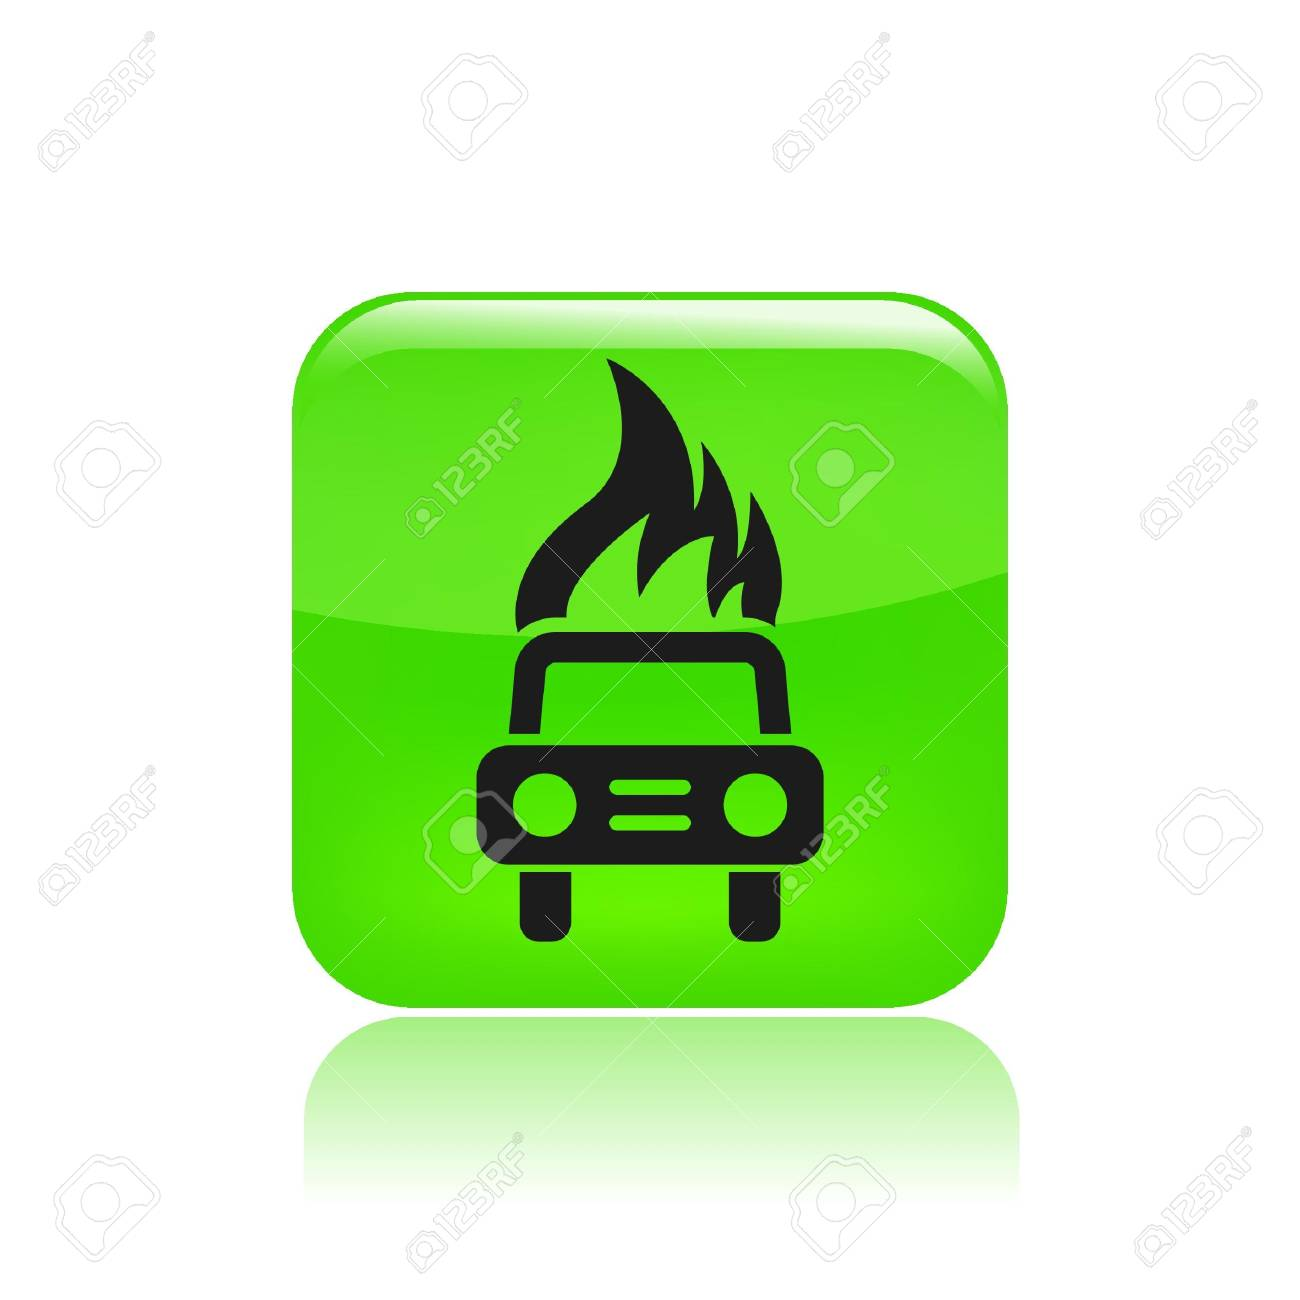 Vector illustration of car burning icon Stock Vector - 12122852